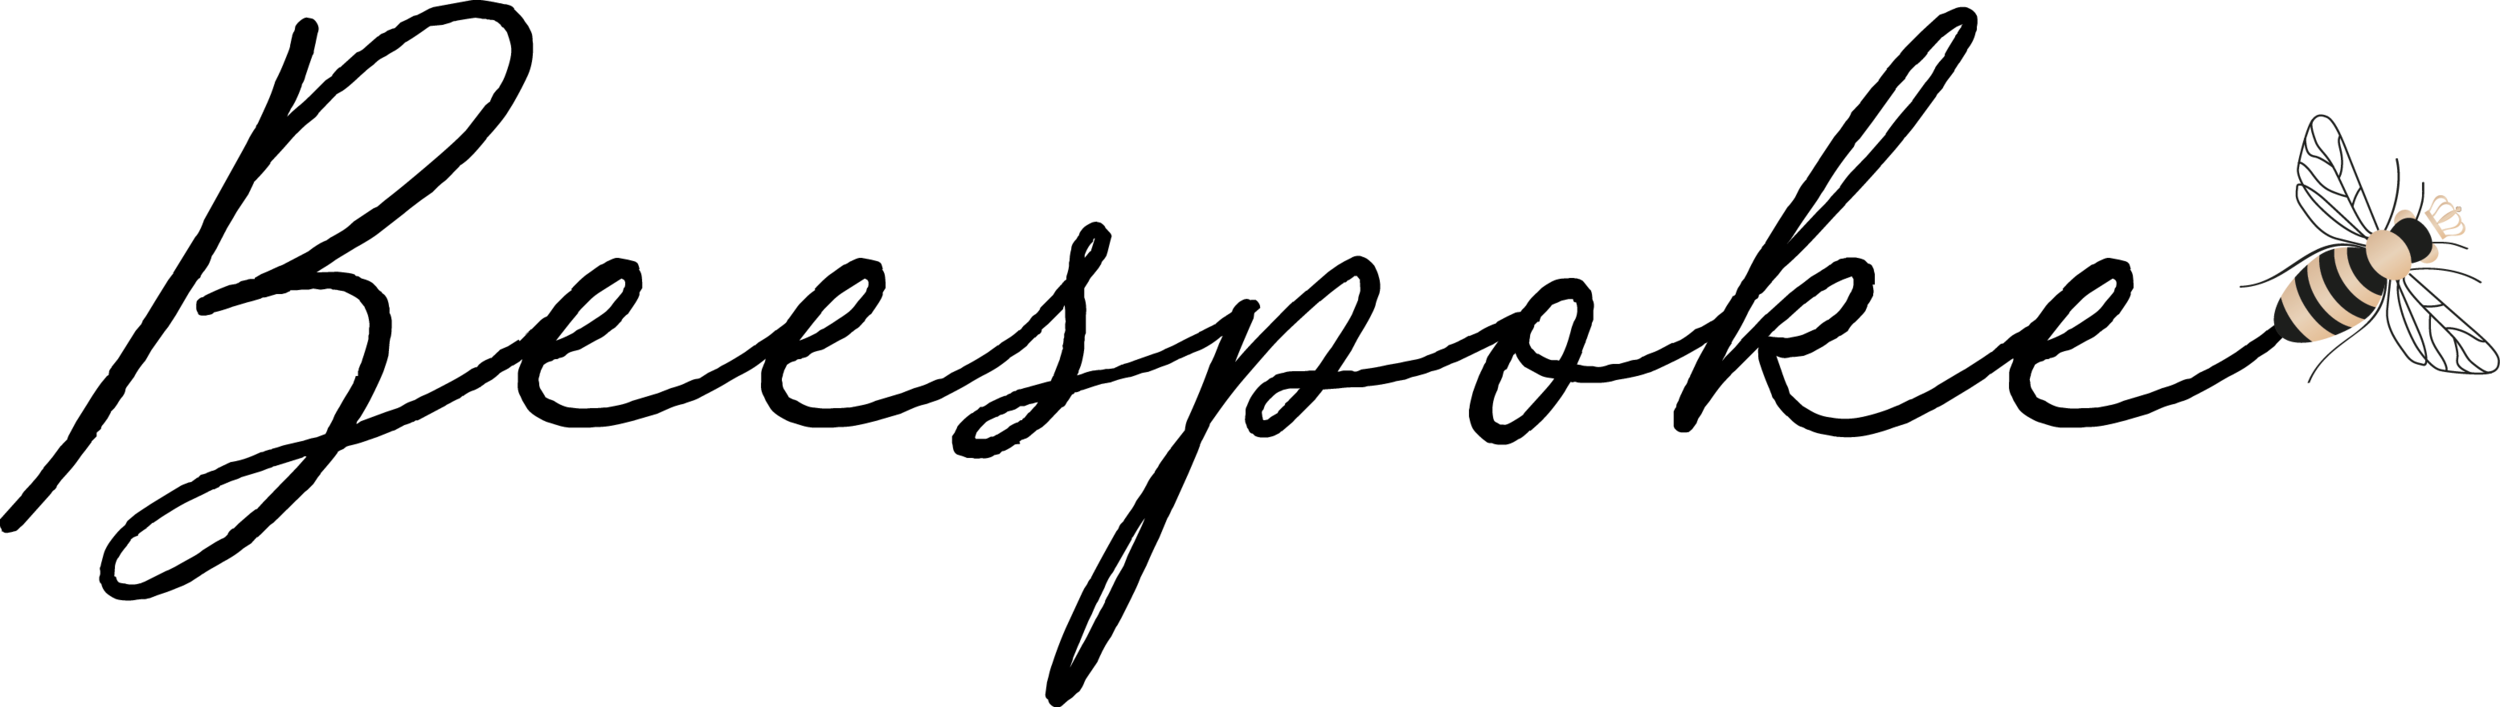 BEESPOKE-PNG.png